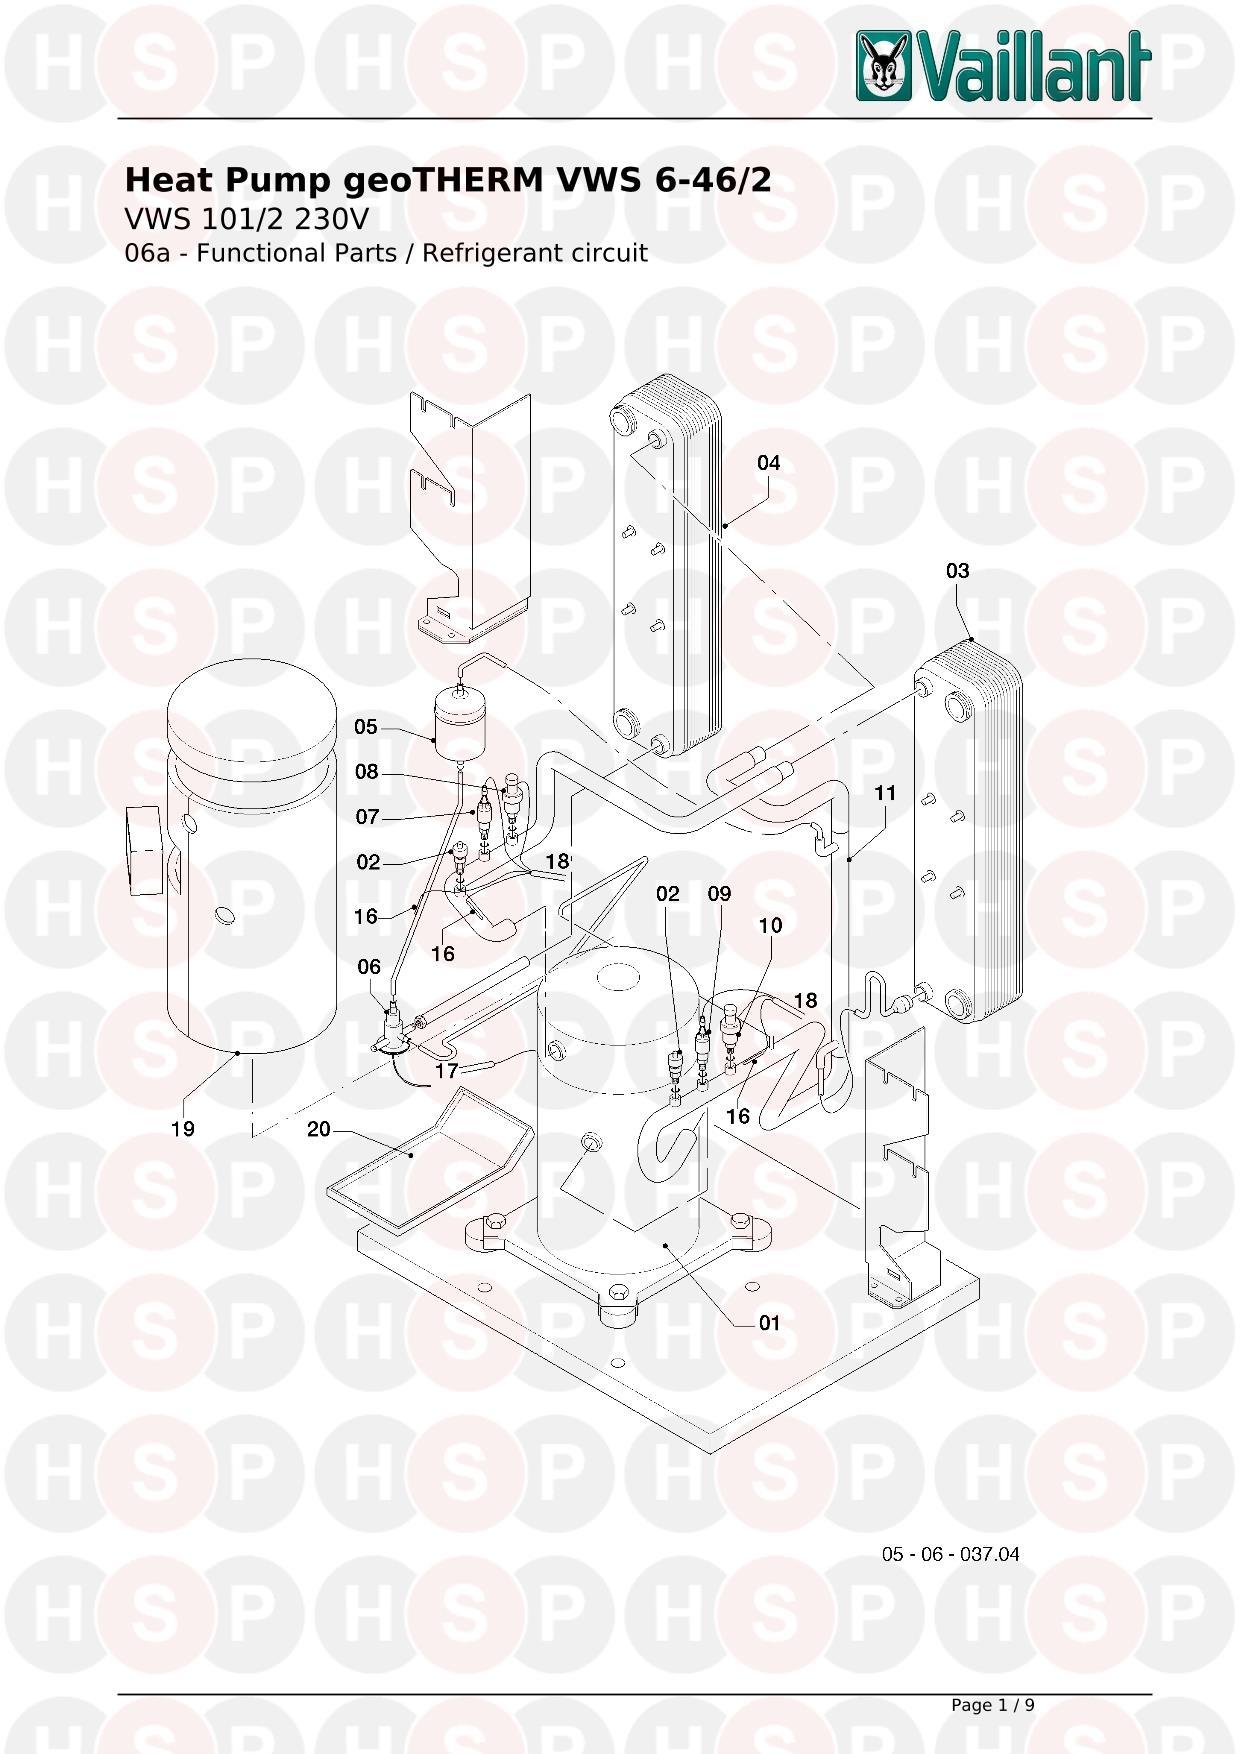 Vaillant gEOTHERM VWS 101/2 230V (6A REFRIGERANT CIRCUIT